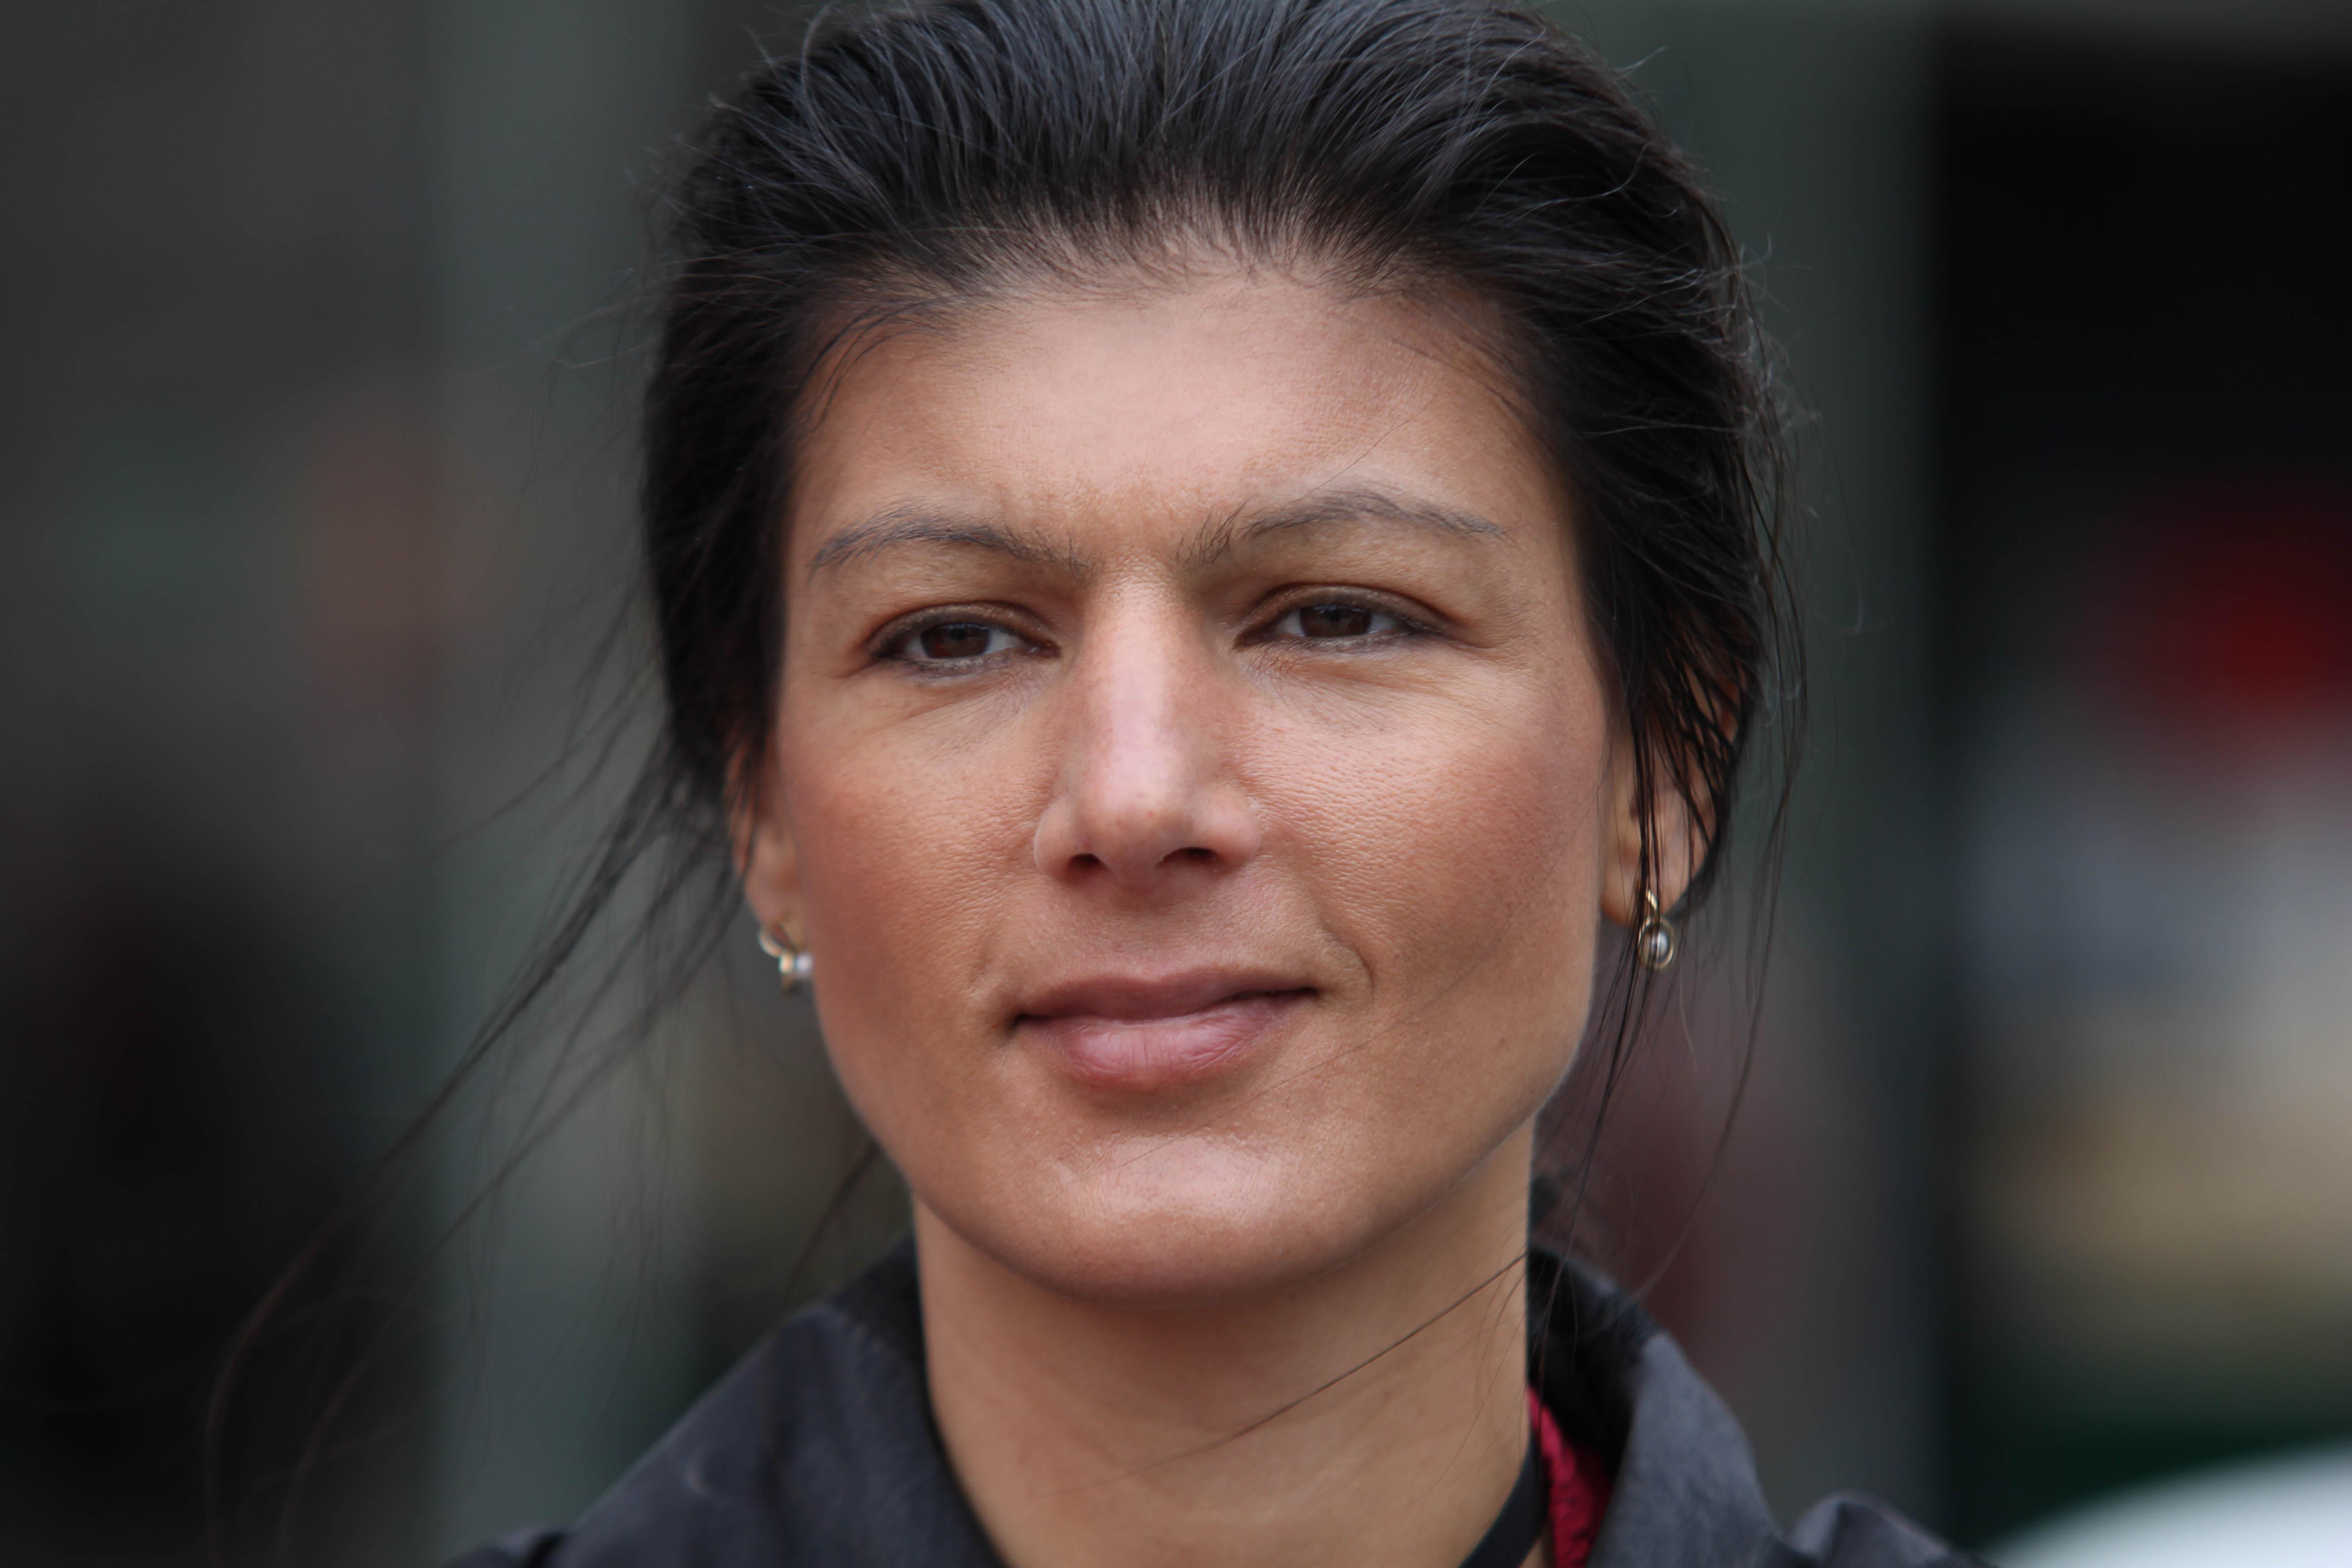 File:Sahra Wagenknecht 2012 3.jpg - Wikimedia Commons